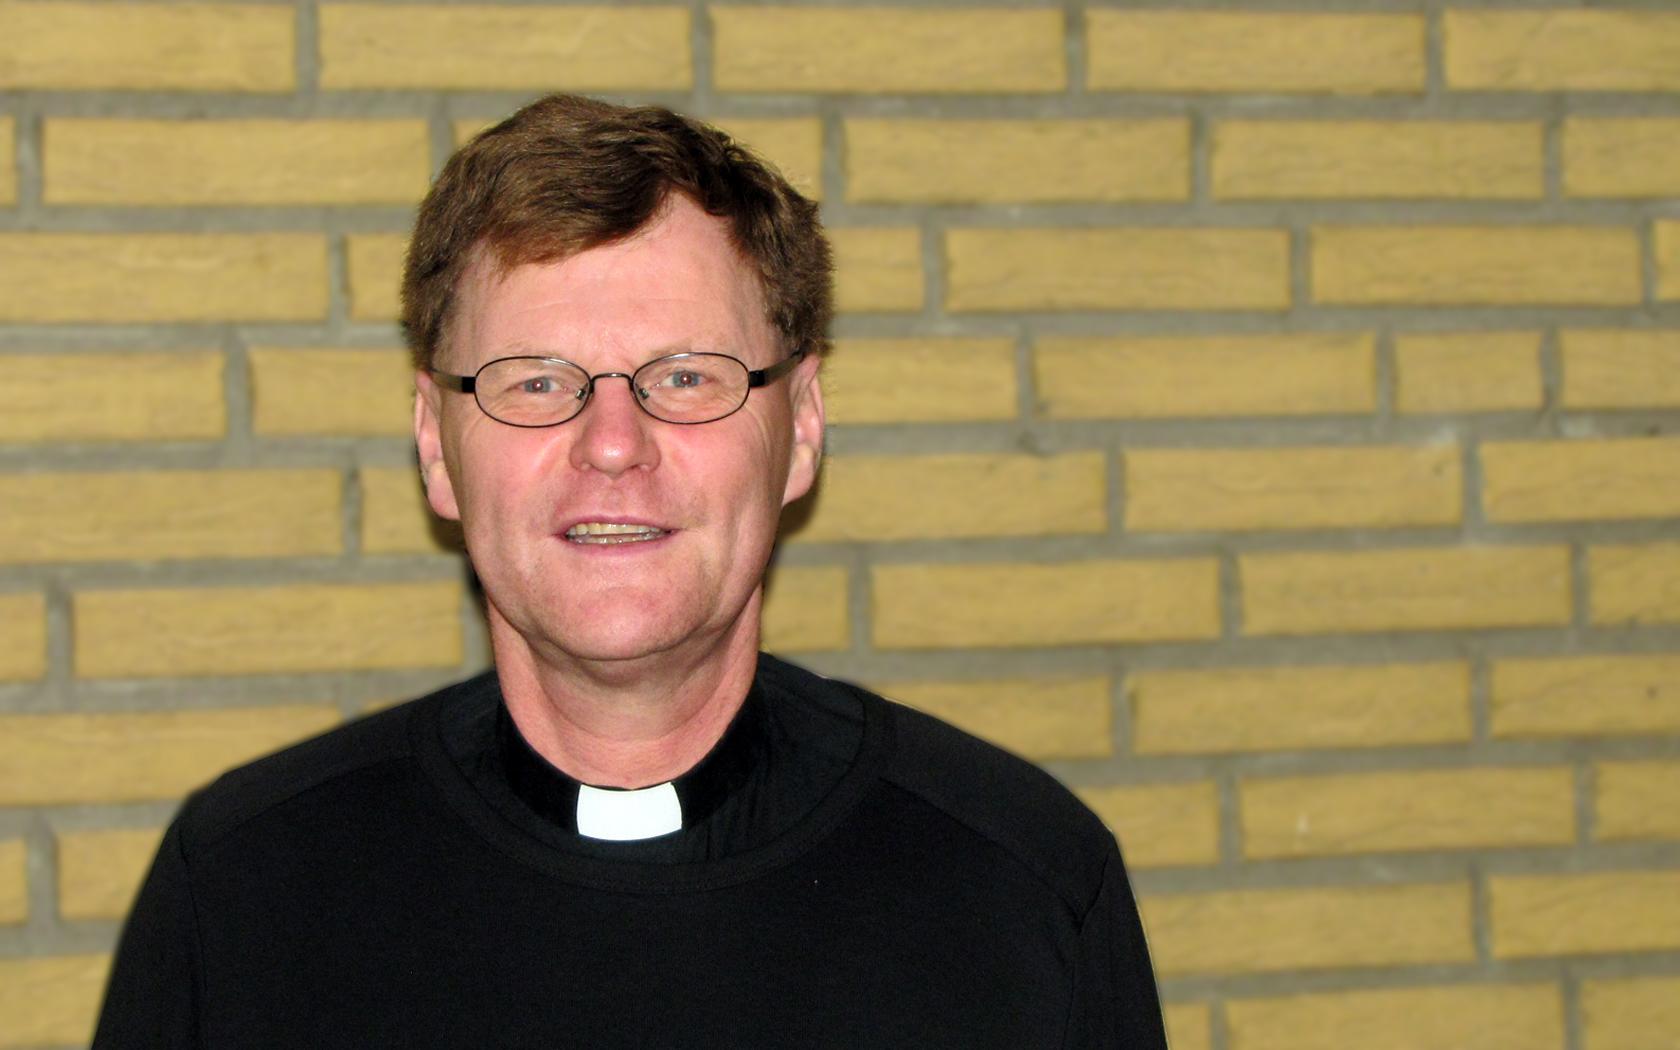 Johannes Epkenhans